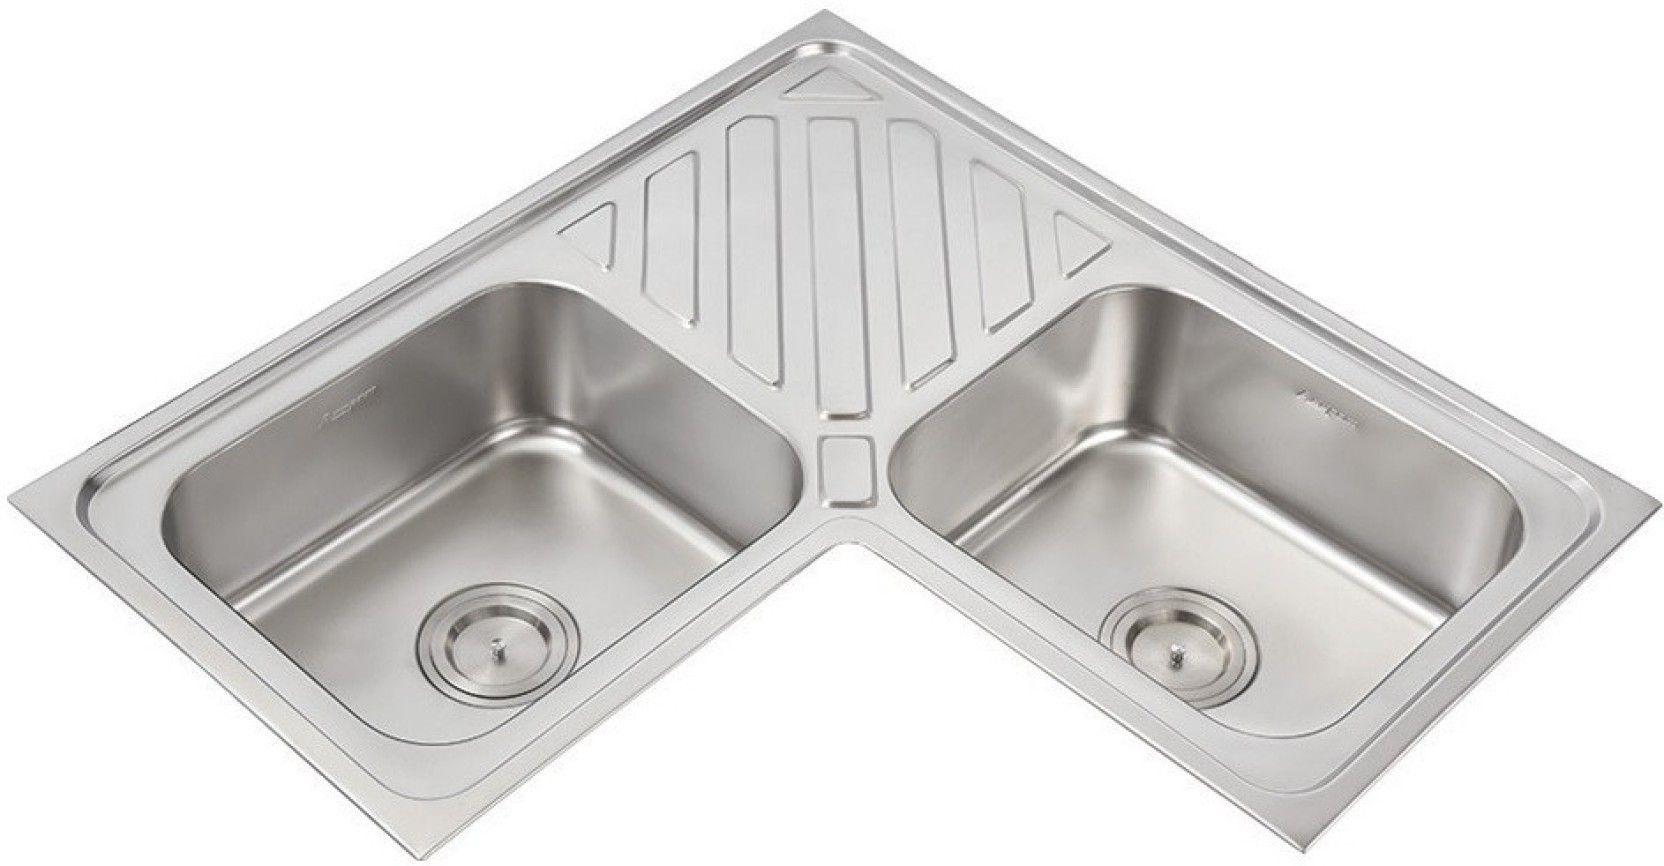 Anupam Luxe Sink Model 307 Corner Basin Price In India Buy Anupam Luxe Sink Model 307 Corner Basin Online At F Corner Basin Sink Stainless Steel Kitchen Sink